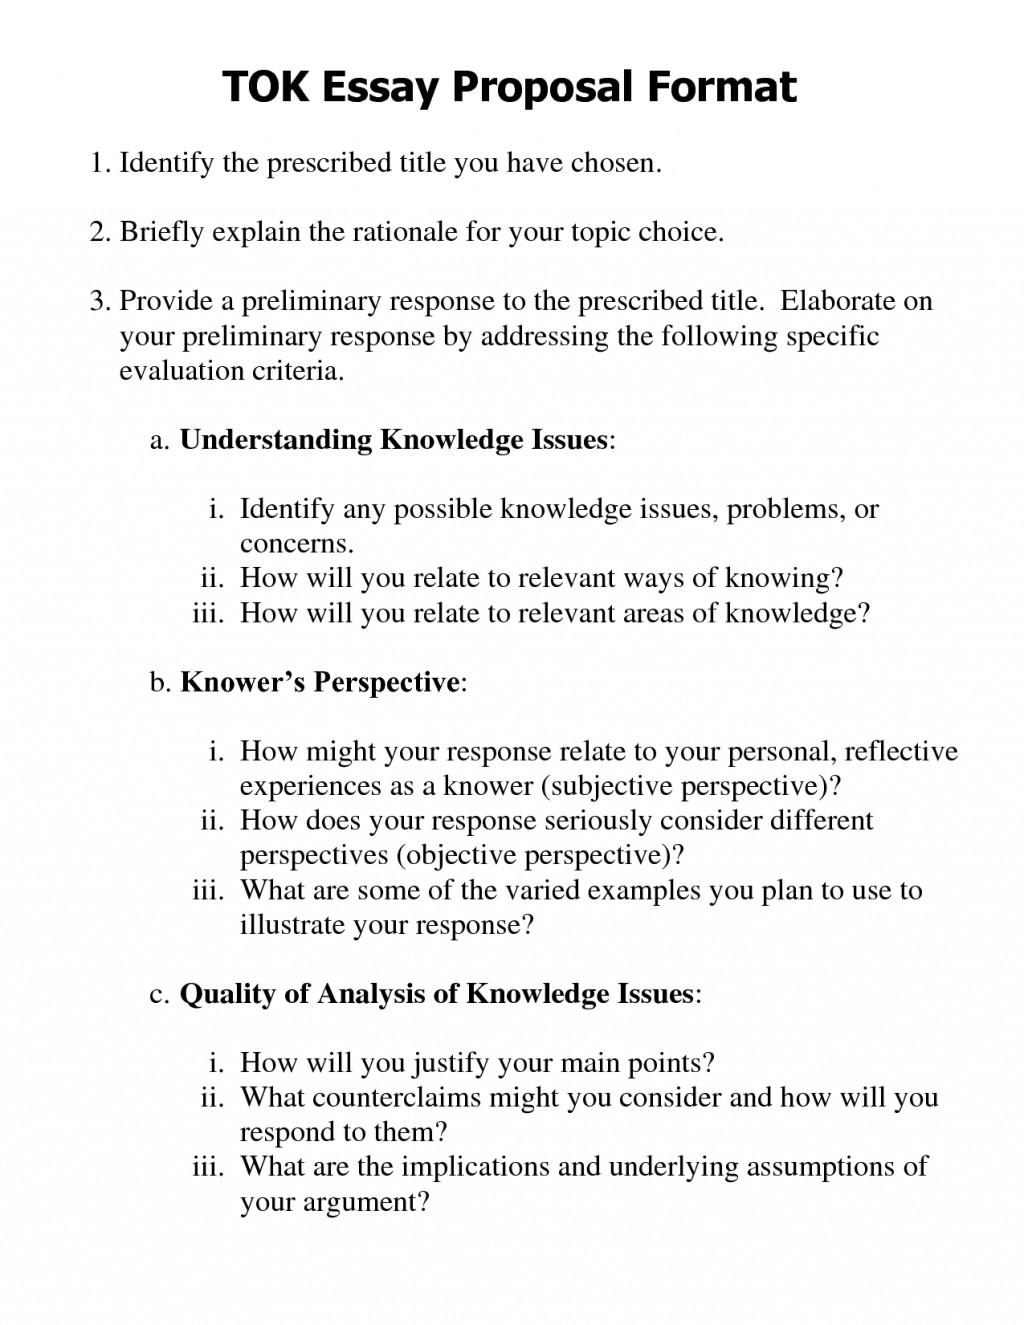 002 Essay Proposal Example Top Samples Mla Format Satirical Ideas Large